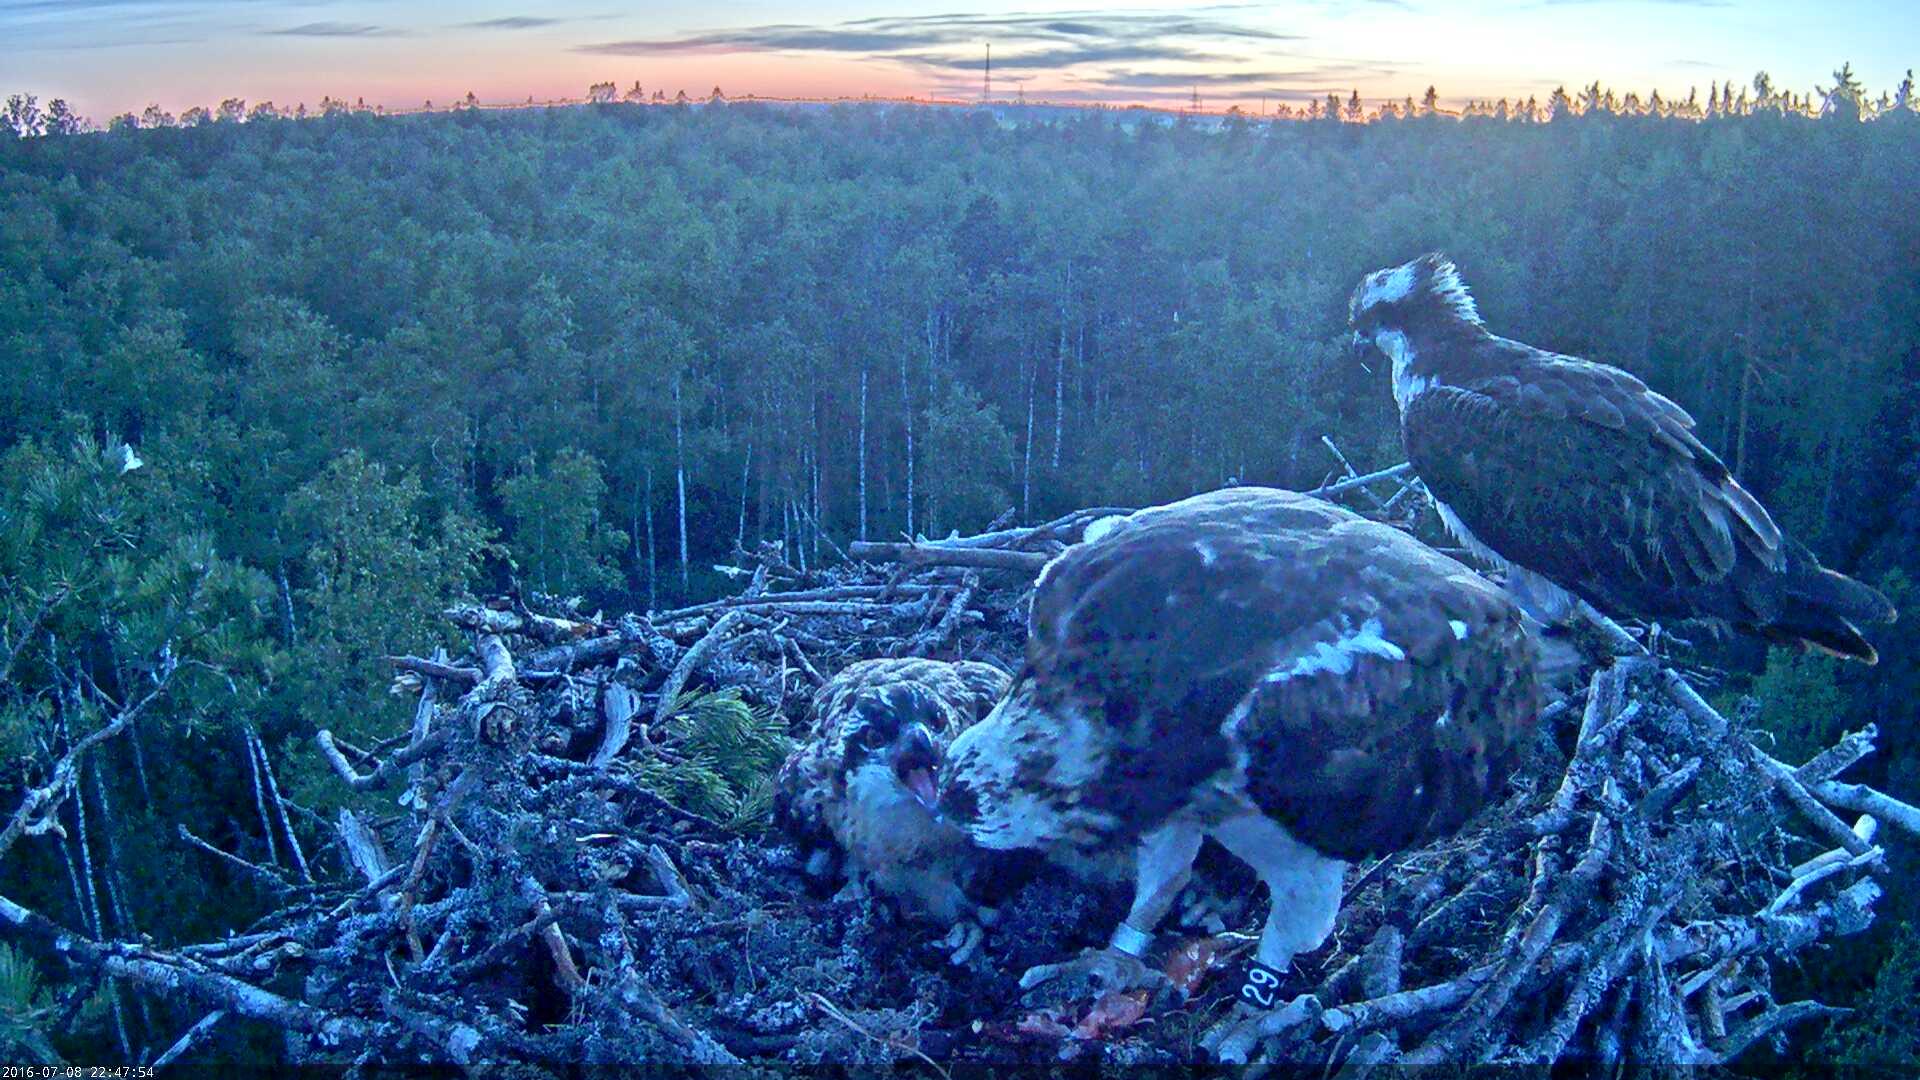 Estonian Osprey Nest Mai & Mati 2016 Kalakotkas-2016-07-08-22-47